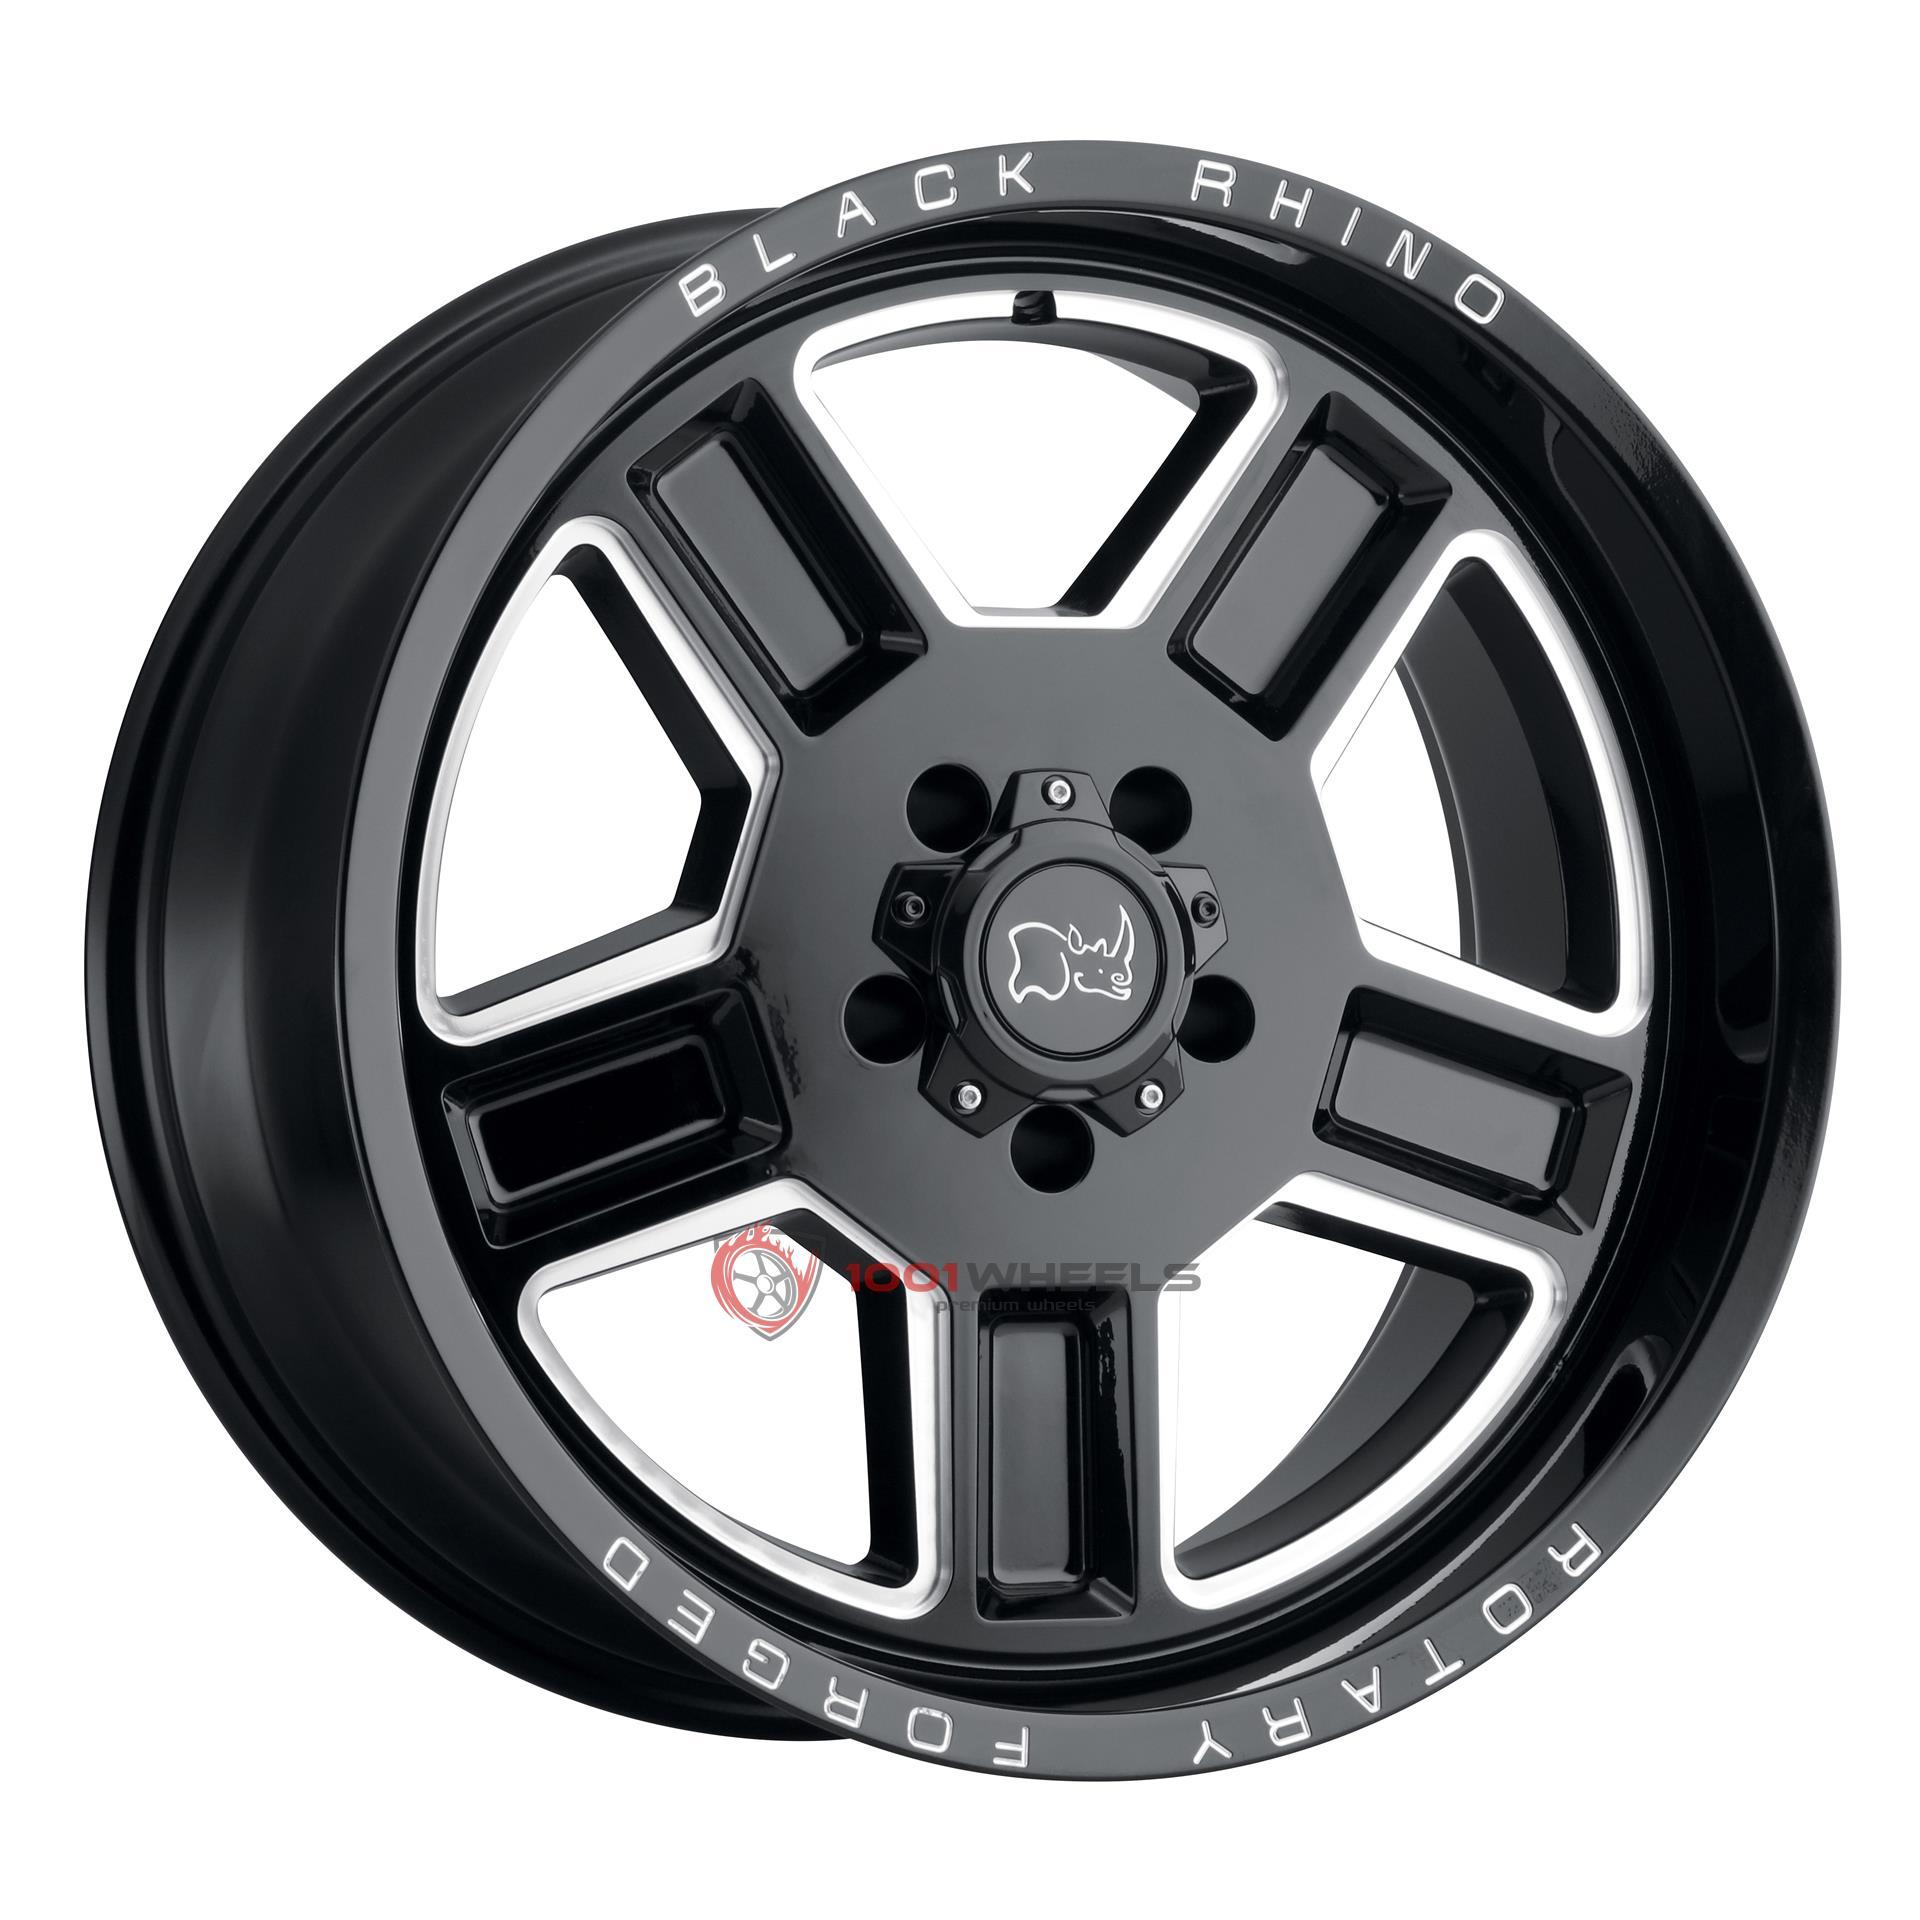 BLACK RHINO CANON gloss-black-wmilled-spoke